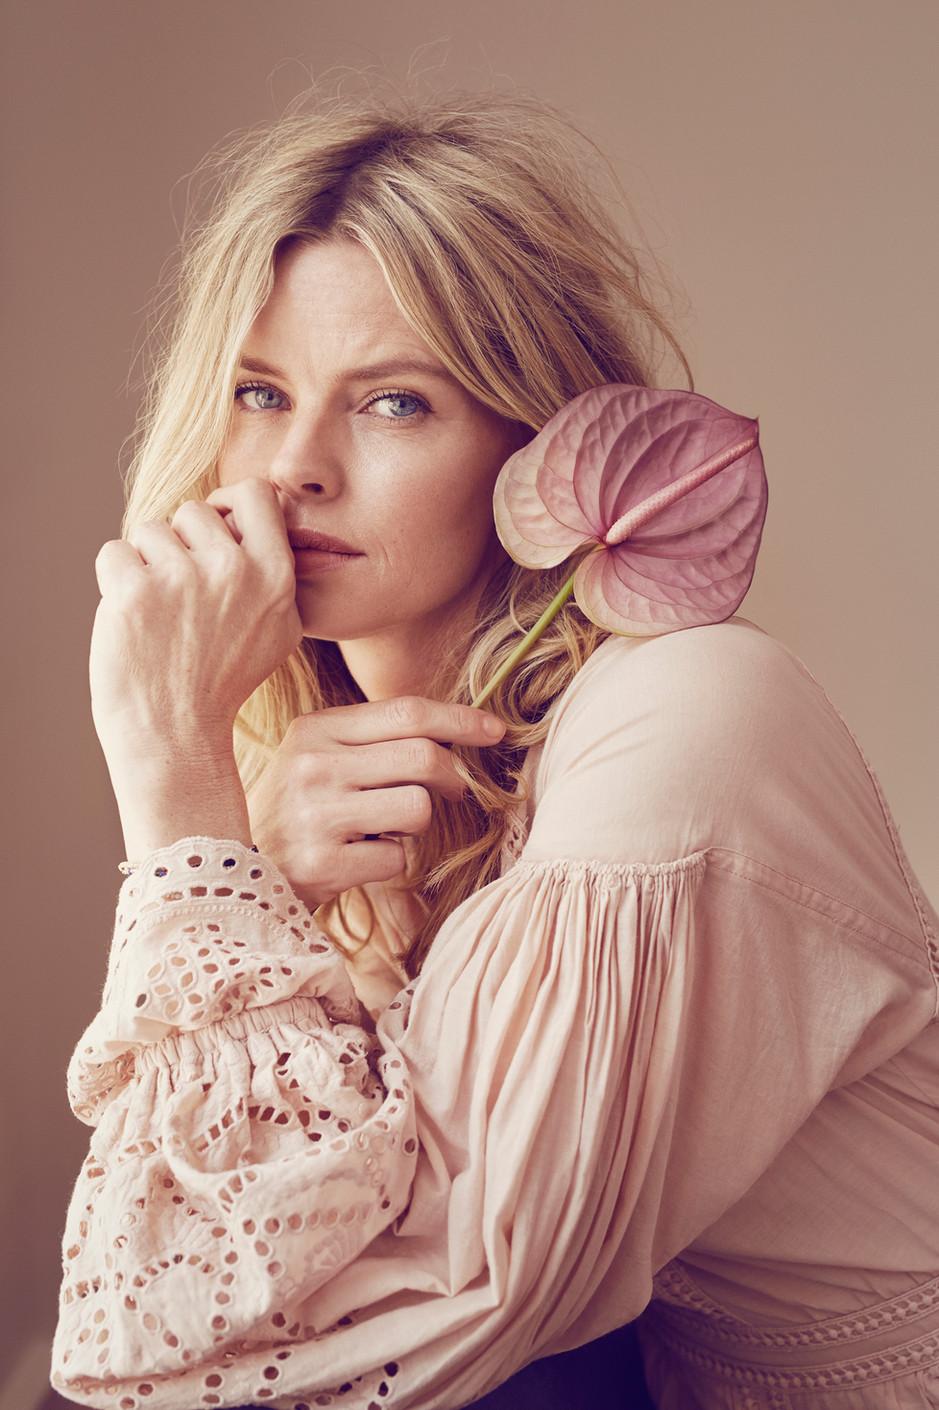 Kamille Beauty - Janne Rugland_1.jpg